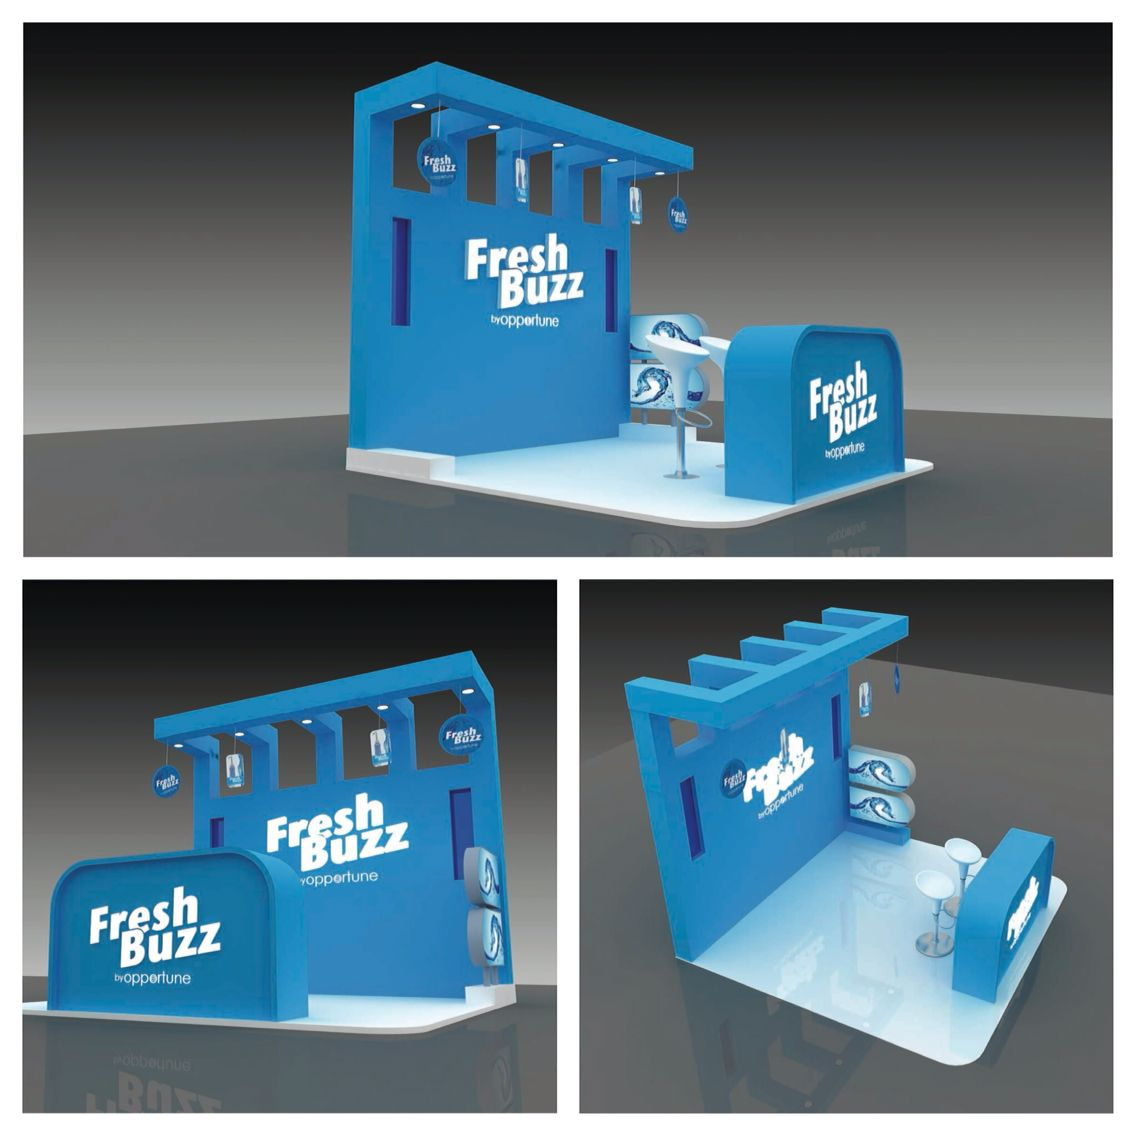 Fresh buzz booth design 3d designs pinterest booth for Fresh design